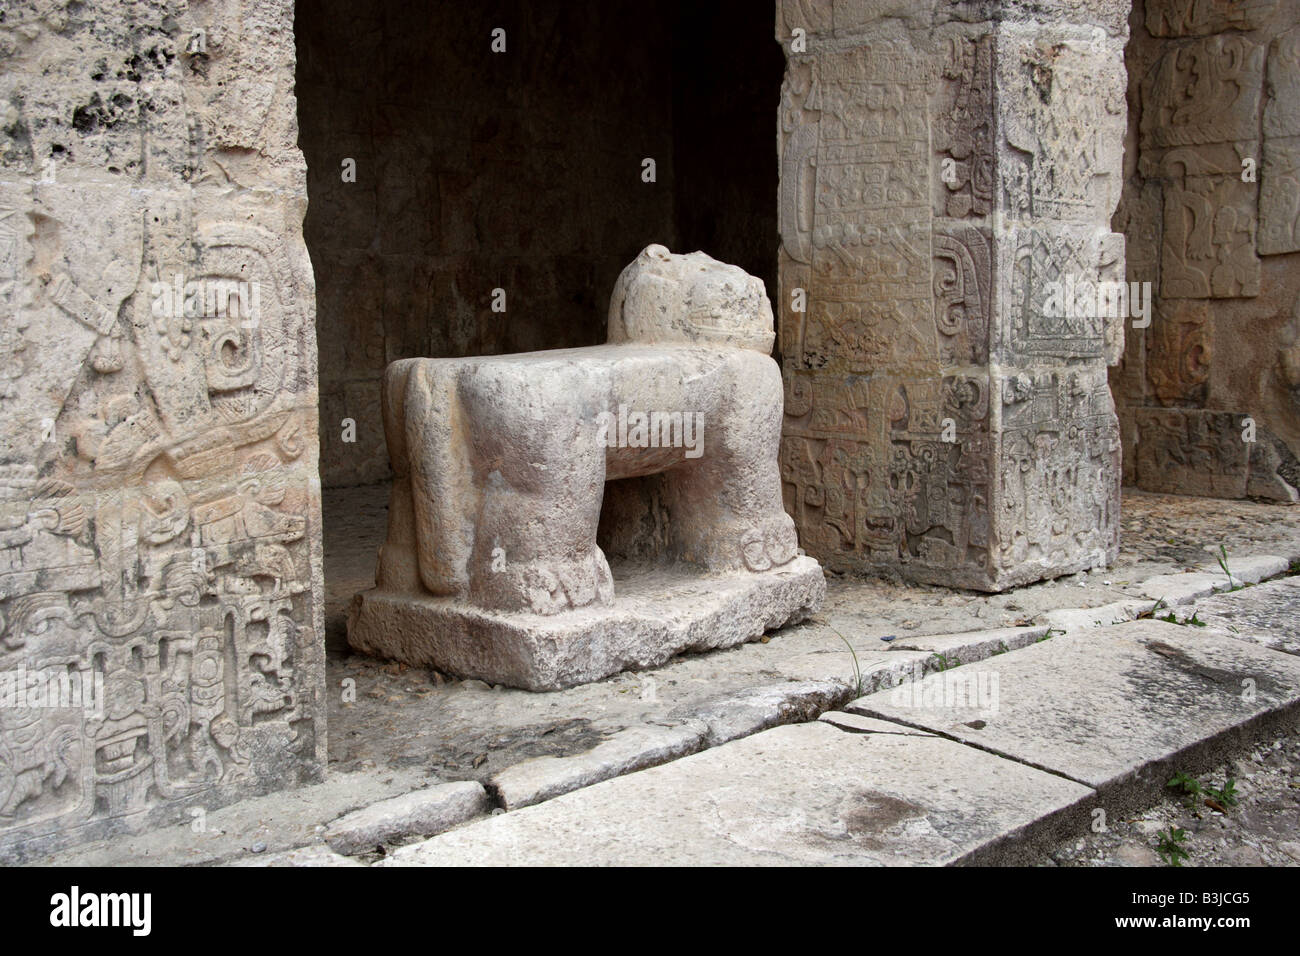 Stone Jaguar at the Entrance to the Great Ballcourt, Juego Pelota, Chichen Itza, Yucatan Peninsular, Mexico Stock Photo